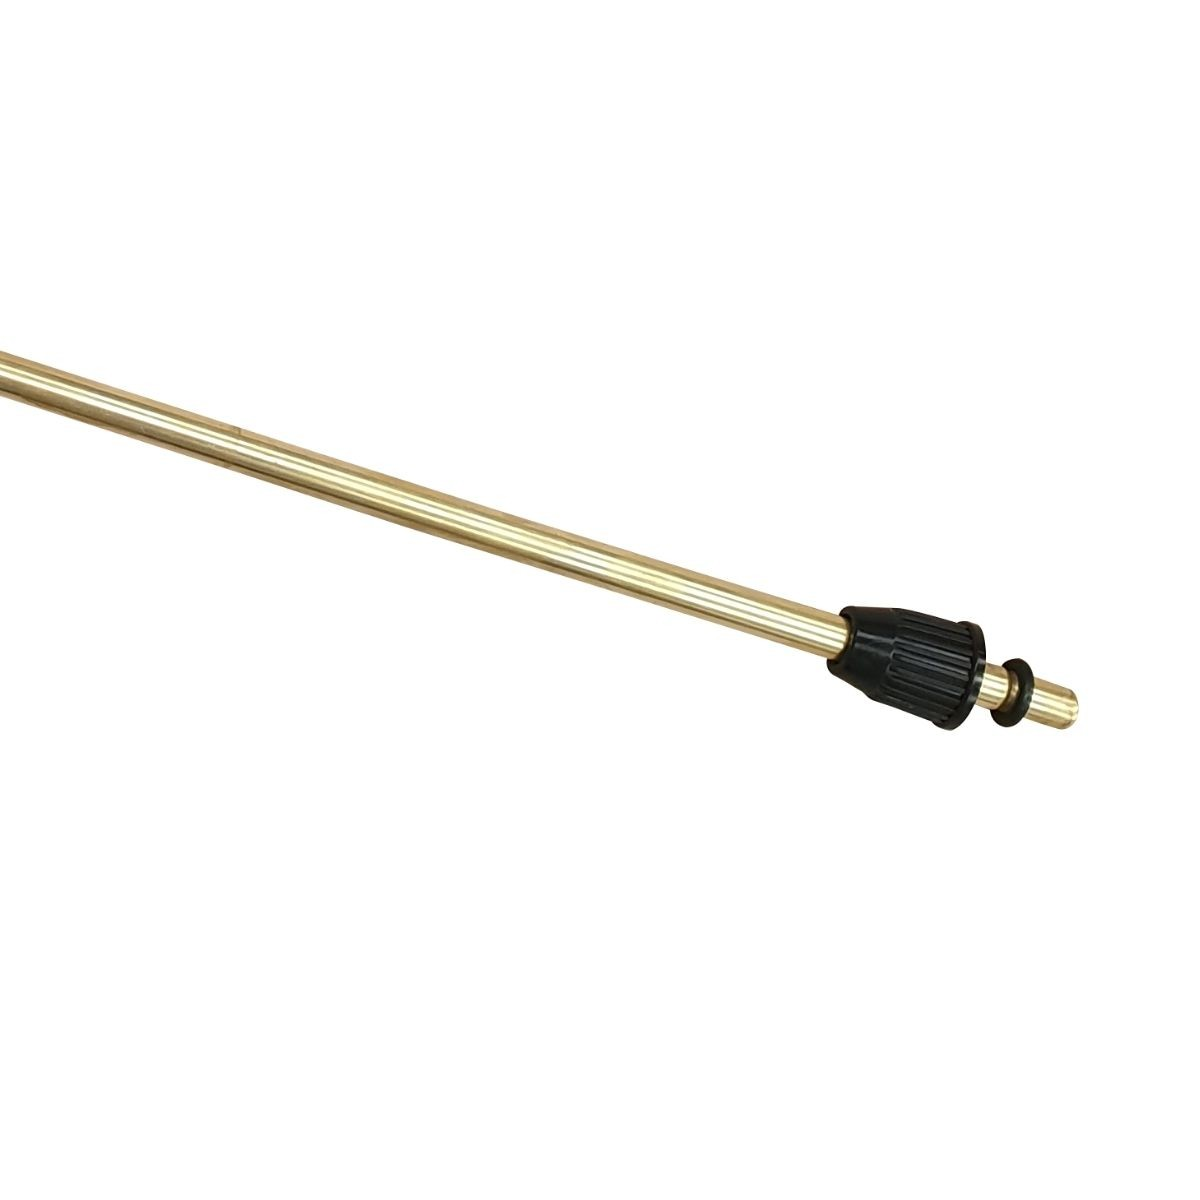 Lança Para Pulverizar De Metal 2 Metros SuperAgri SALP2M